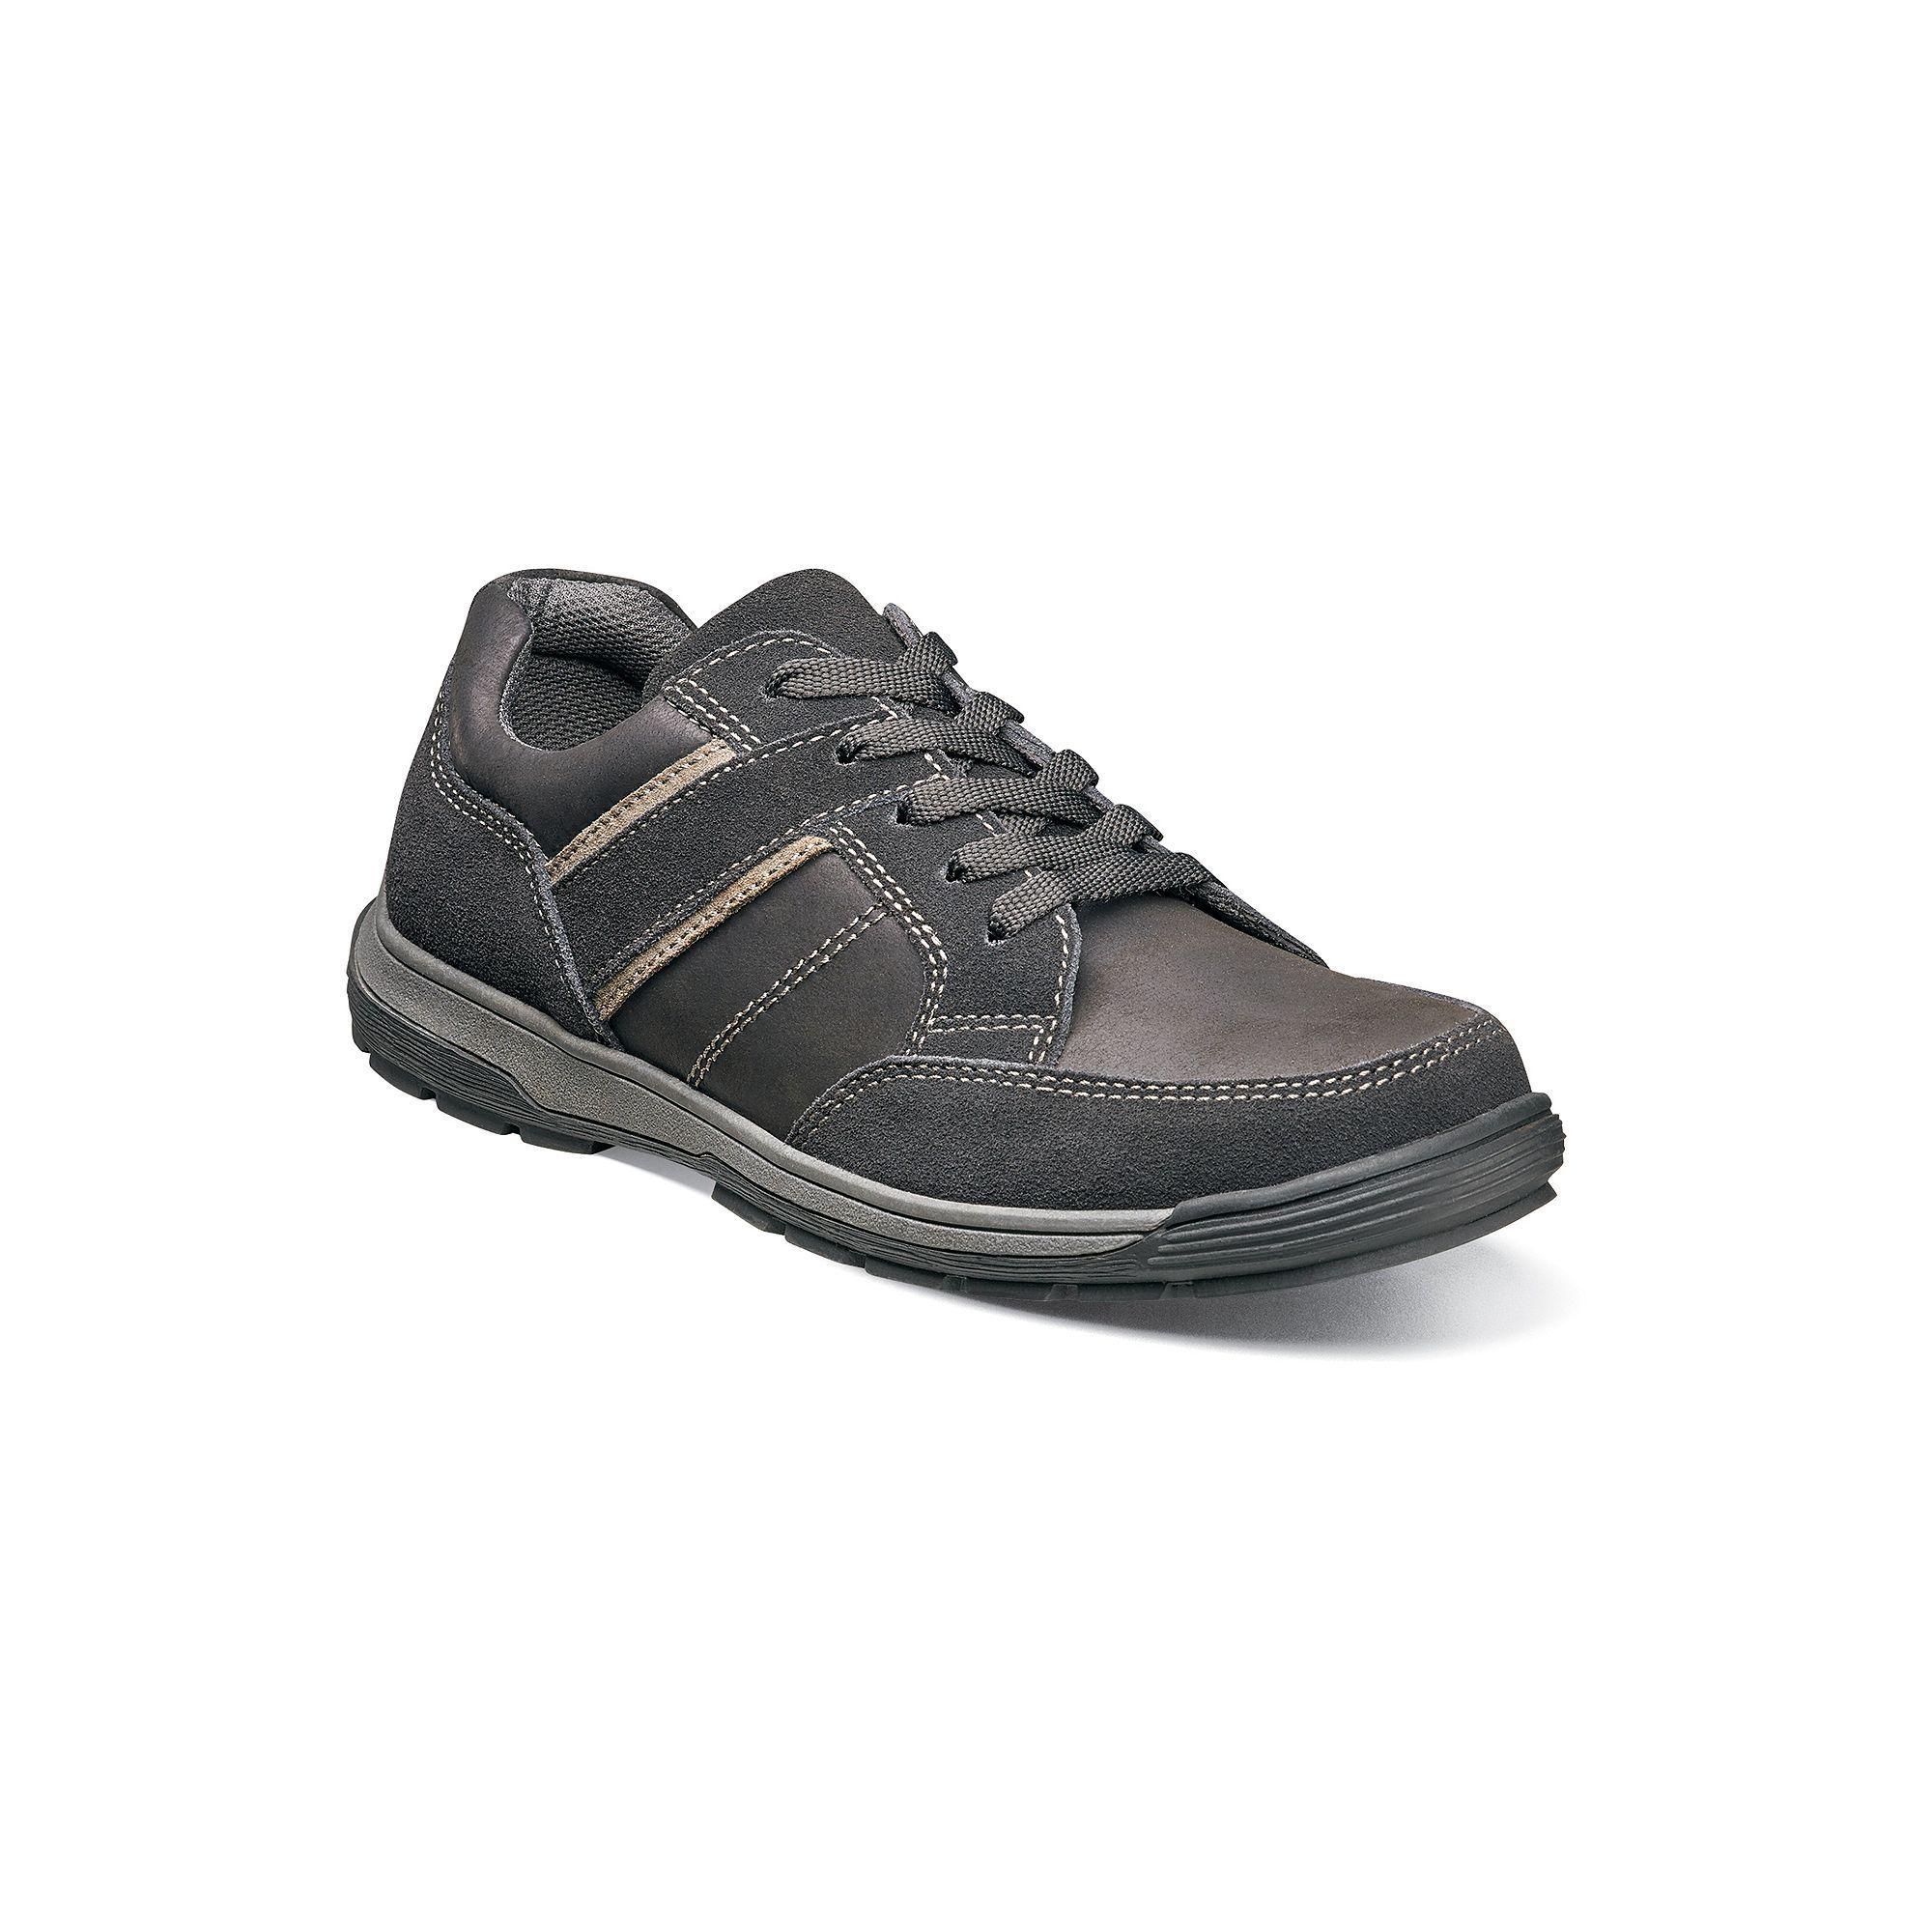 Nunn Bush Layton Men's Casual ... Shoes JroMhXXYZ